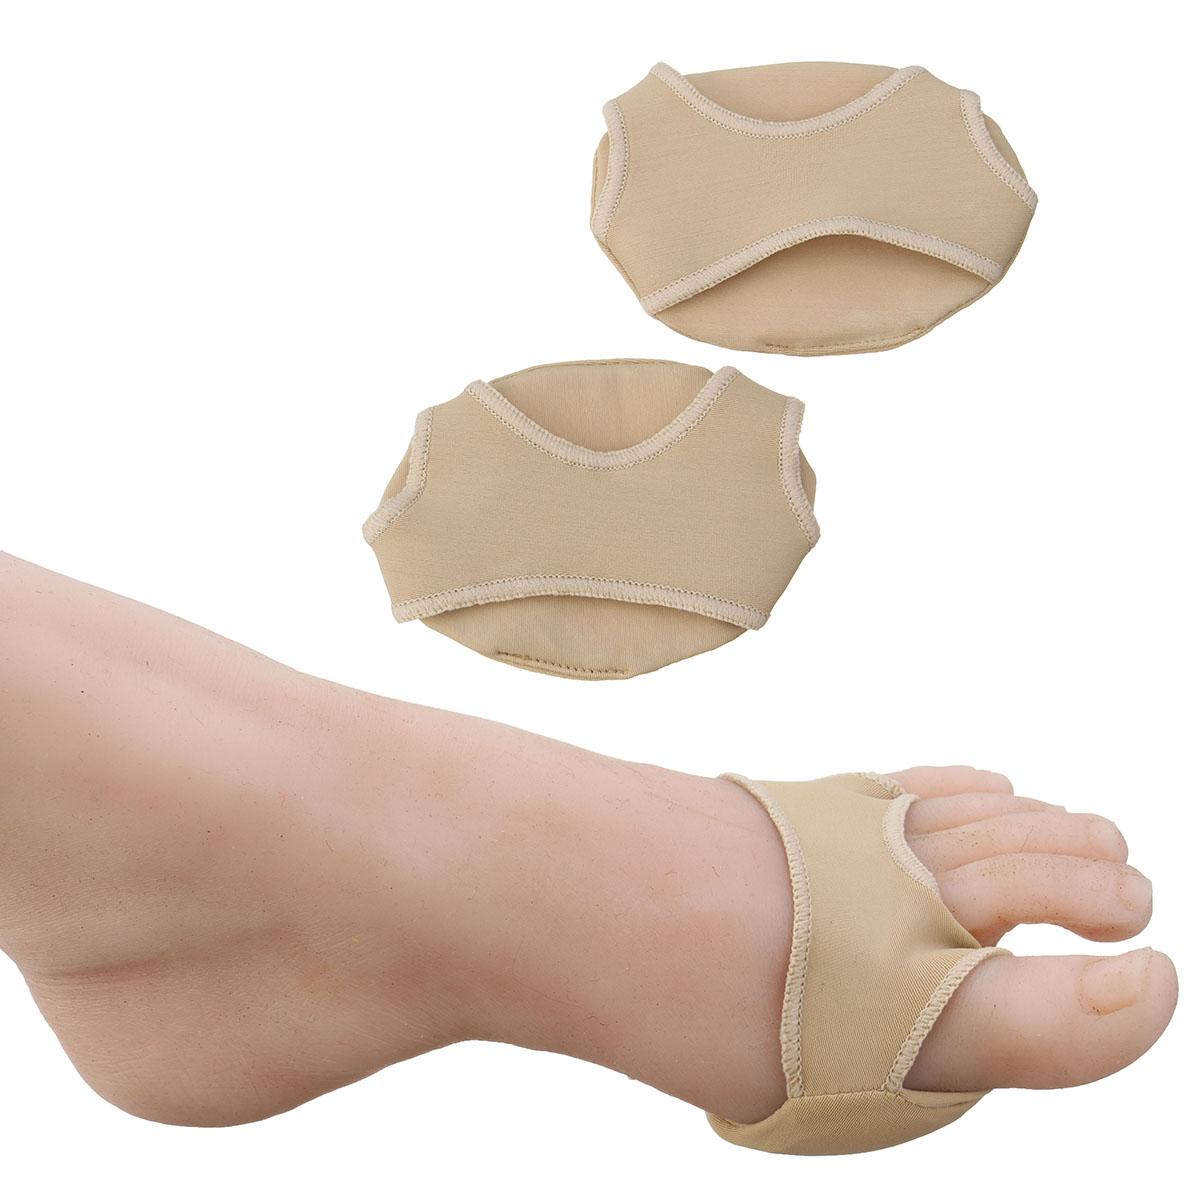 1Pair Footful Ball Spandex Foot Gel Pads Cushion Forefoot Metatarsal High Heel Shoes Accessories